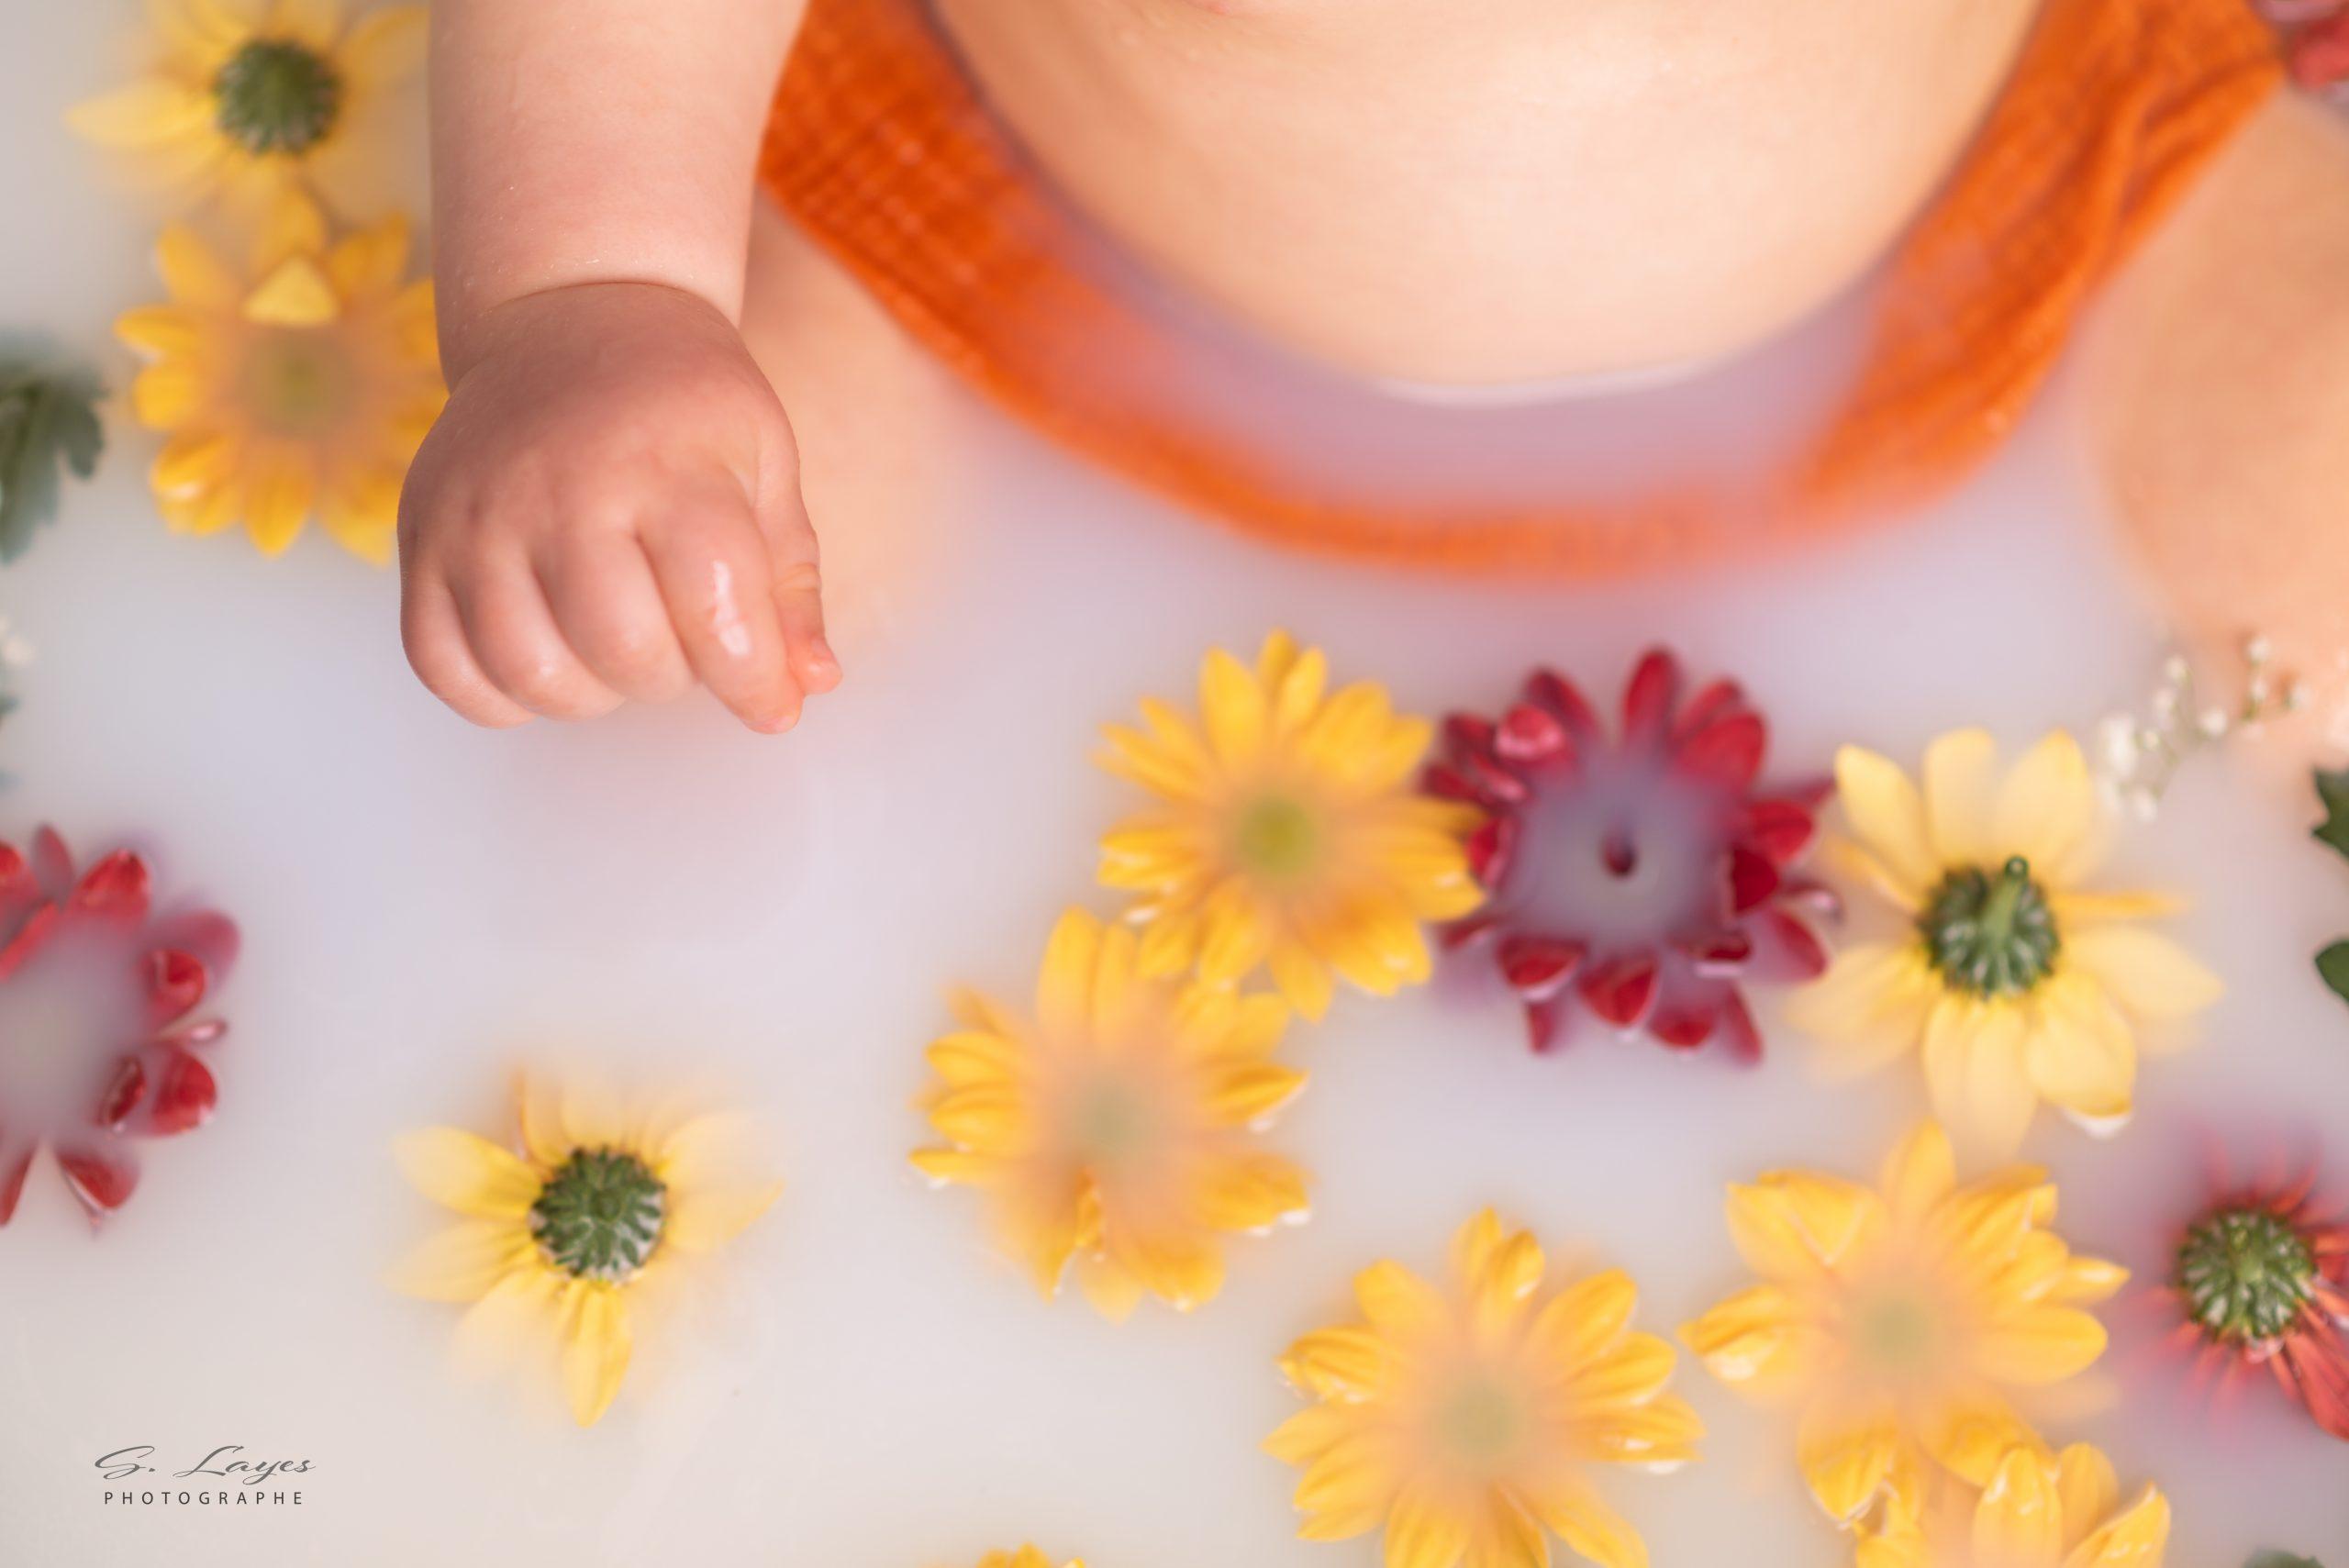 Bain de lait stephanie layes photographe